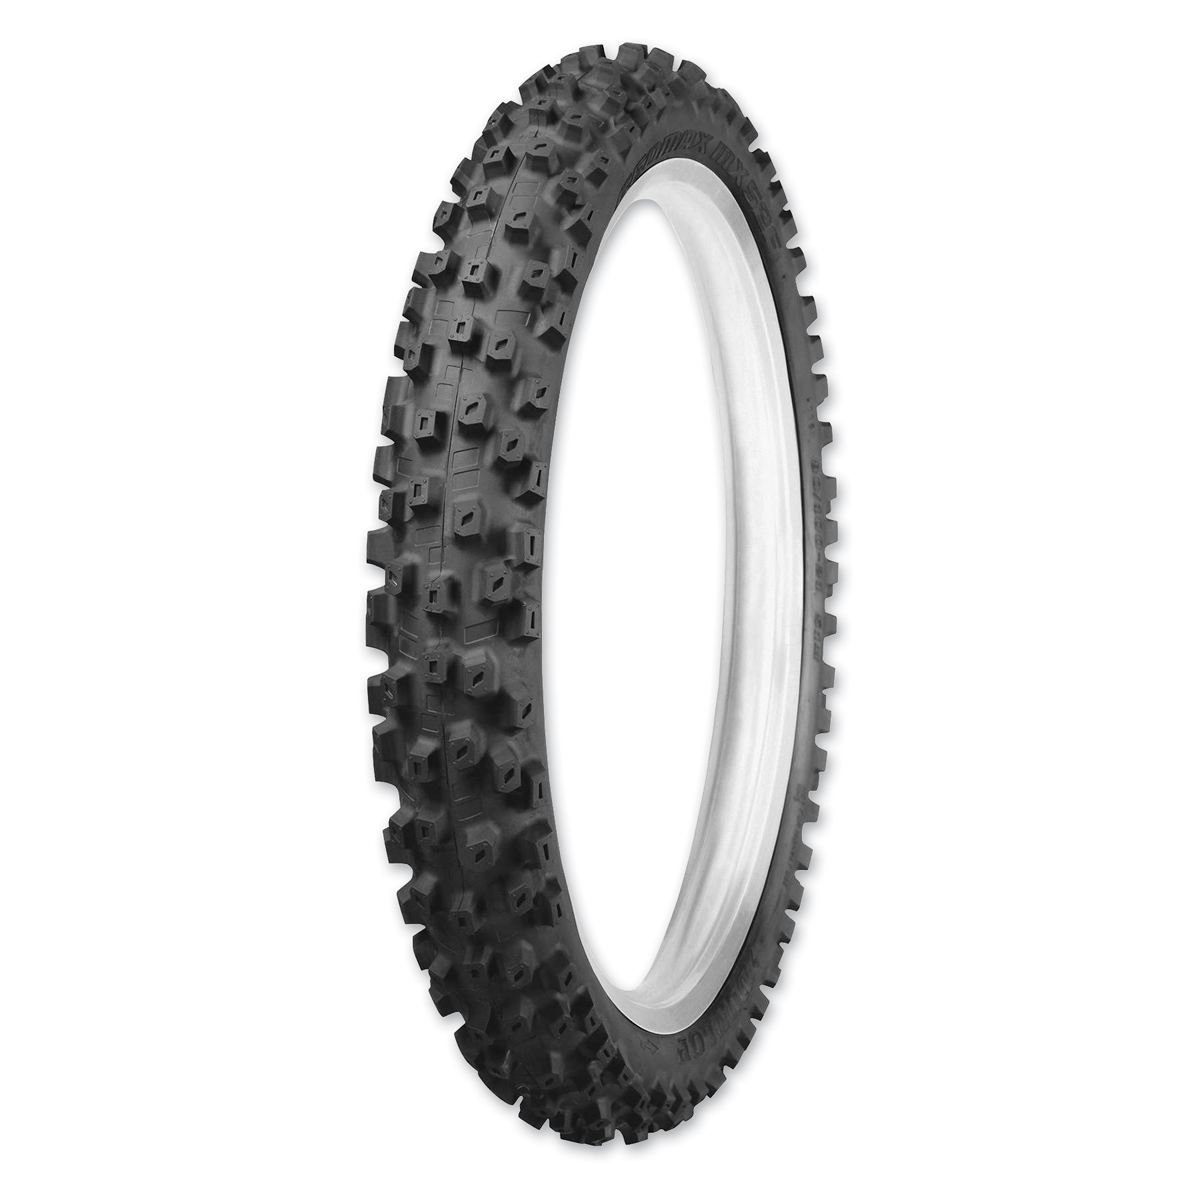 Dunlop MX52 70/100-17 I/T-H/T Front Tire